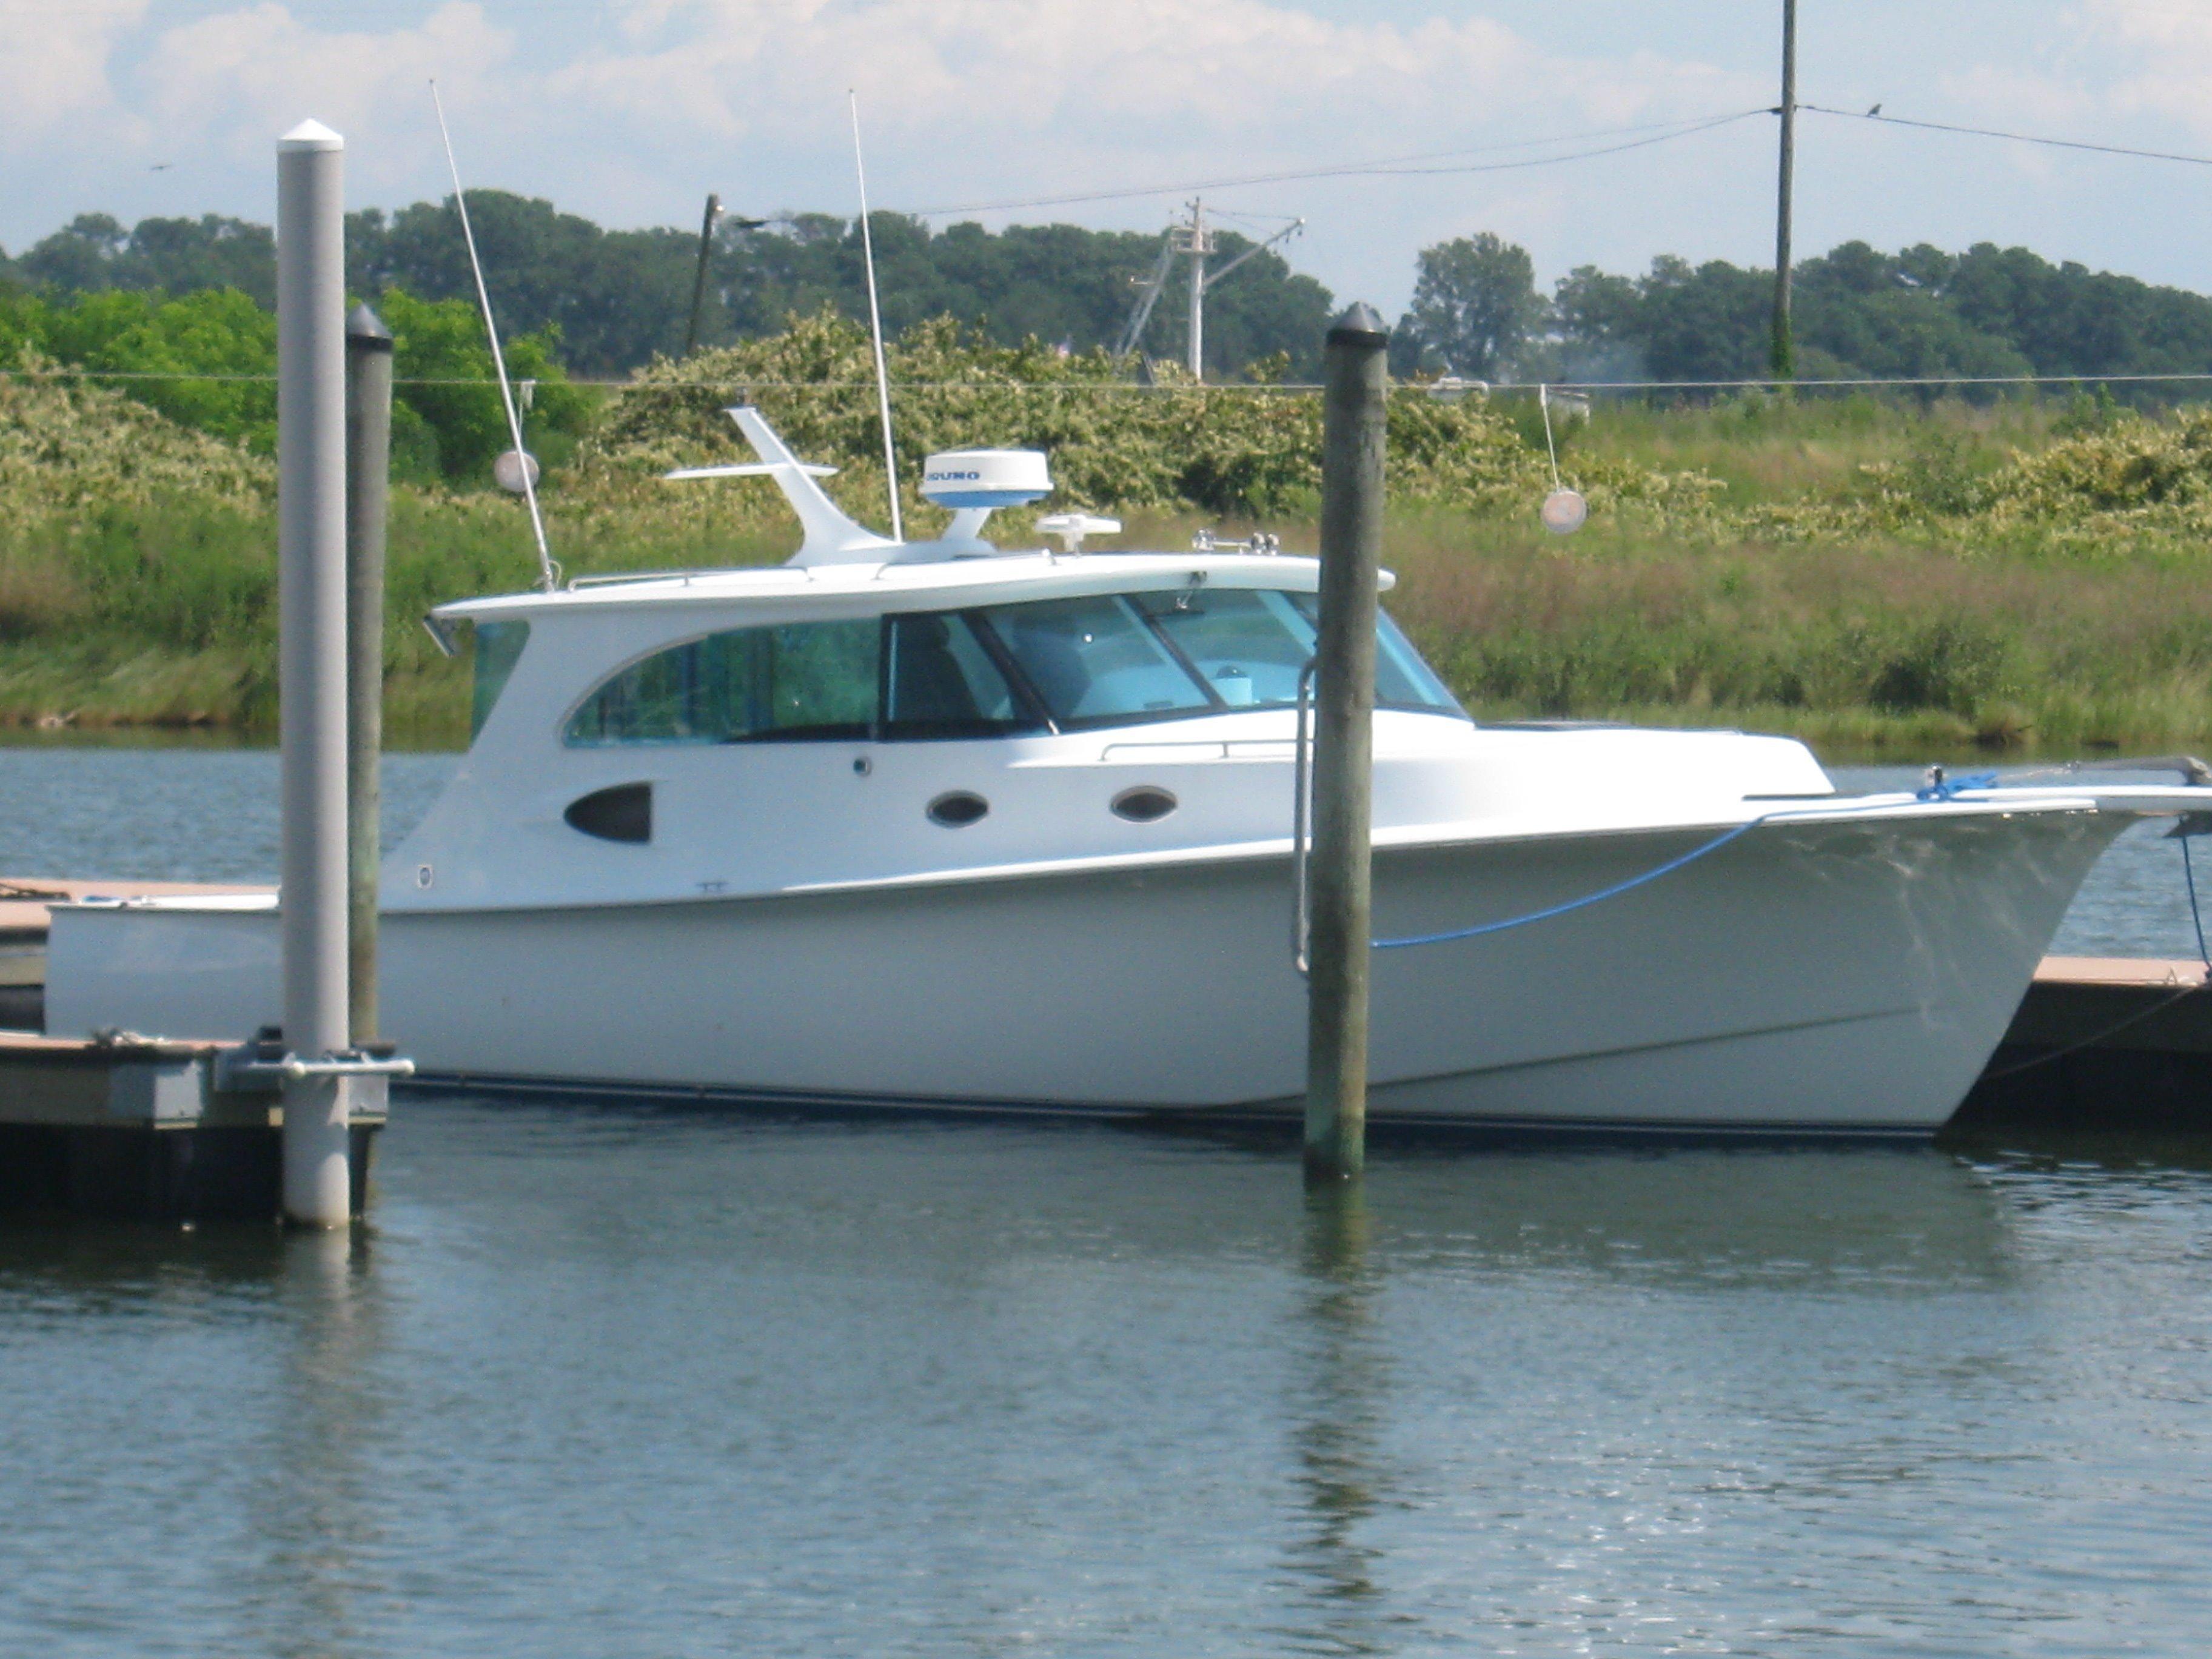 2006 Jennings Hard Top Express Power Boat For Sale - www.yachtworld.com